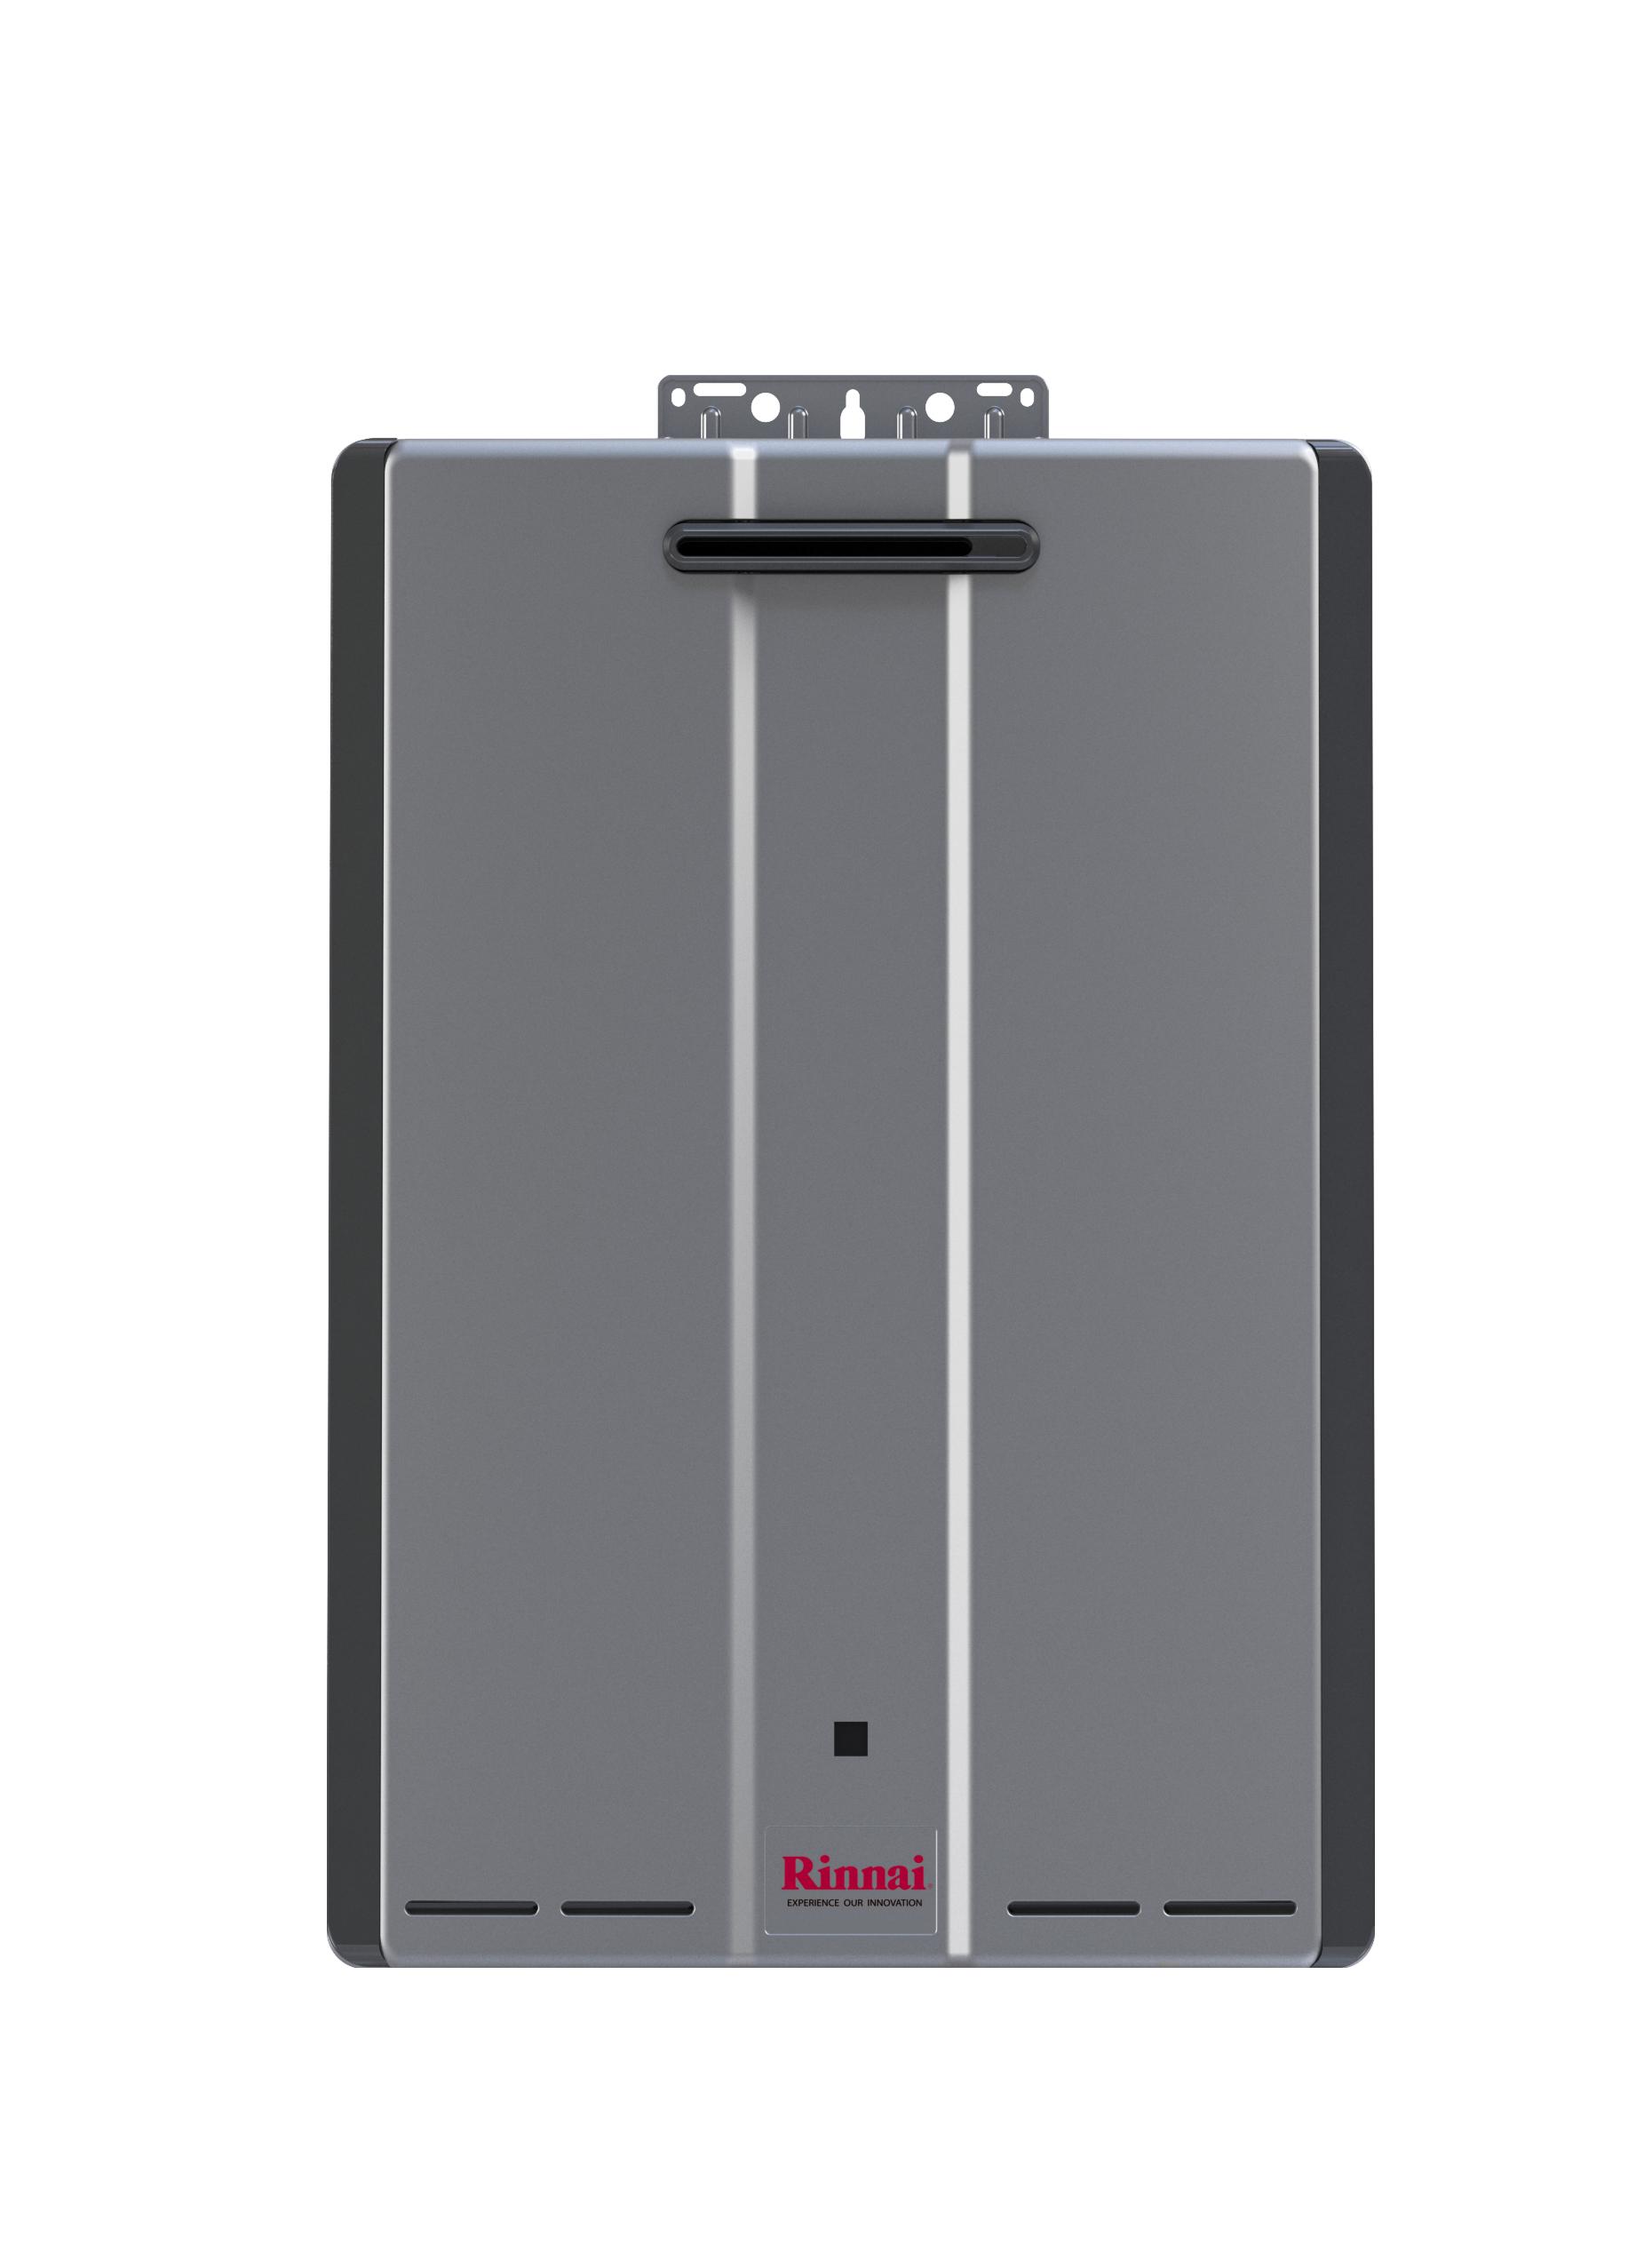 Ru160ep Tankless Water Heater Rinnai